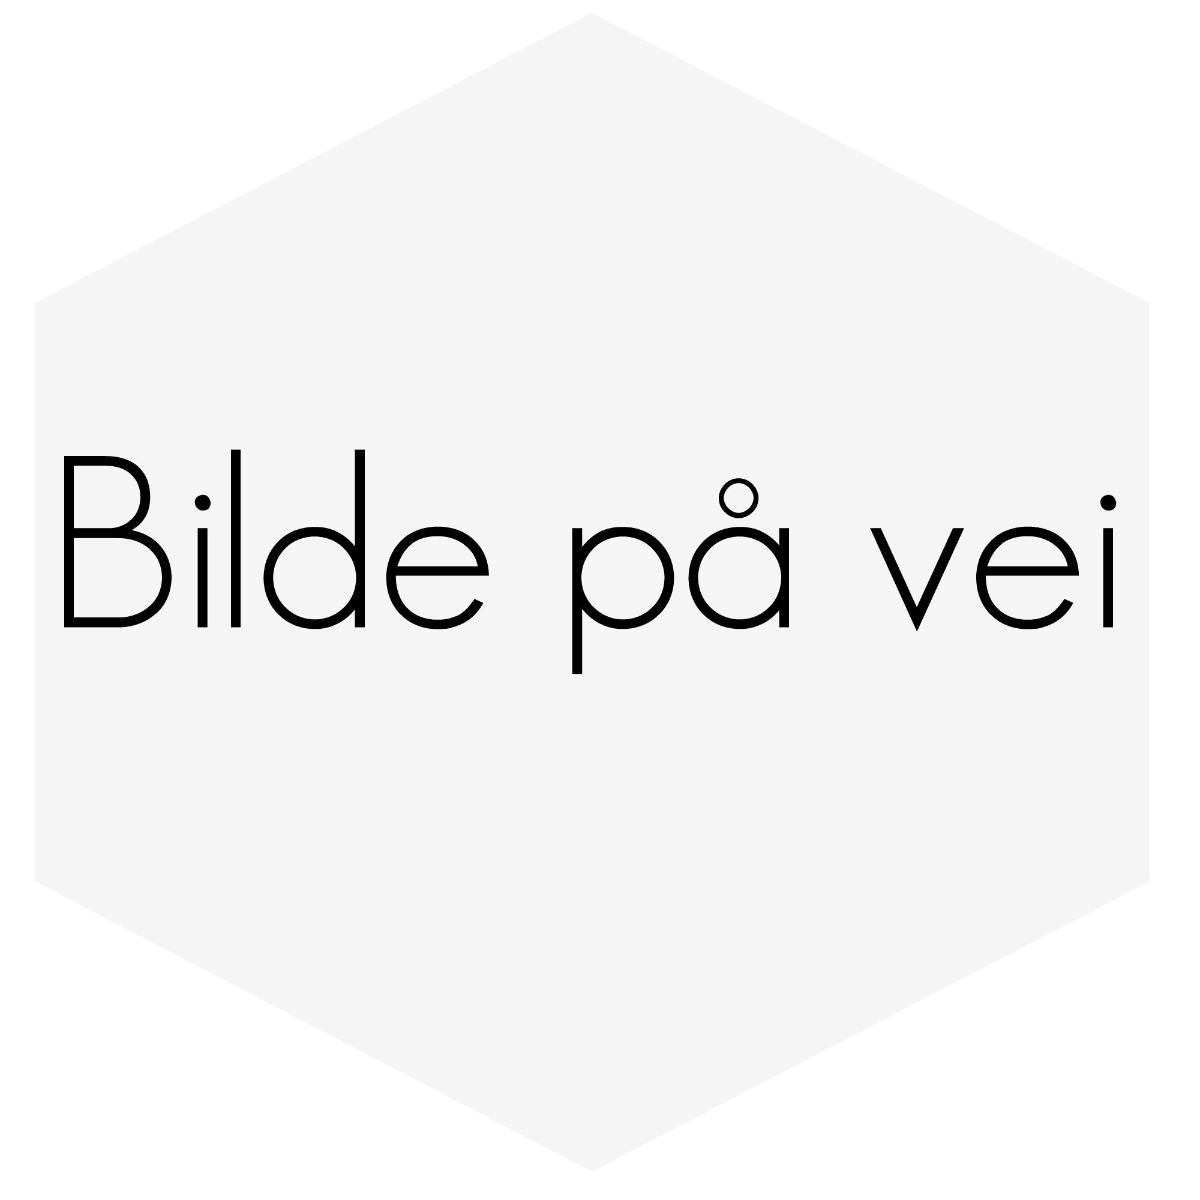 SILIKONSLANGE ARMERT BLÅ 0,43'' (11MM) ,pris pr meter